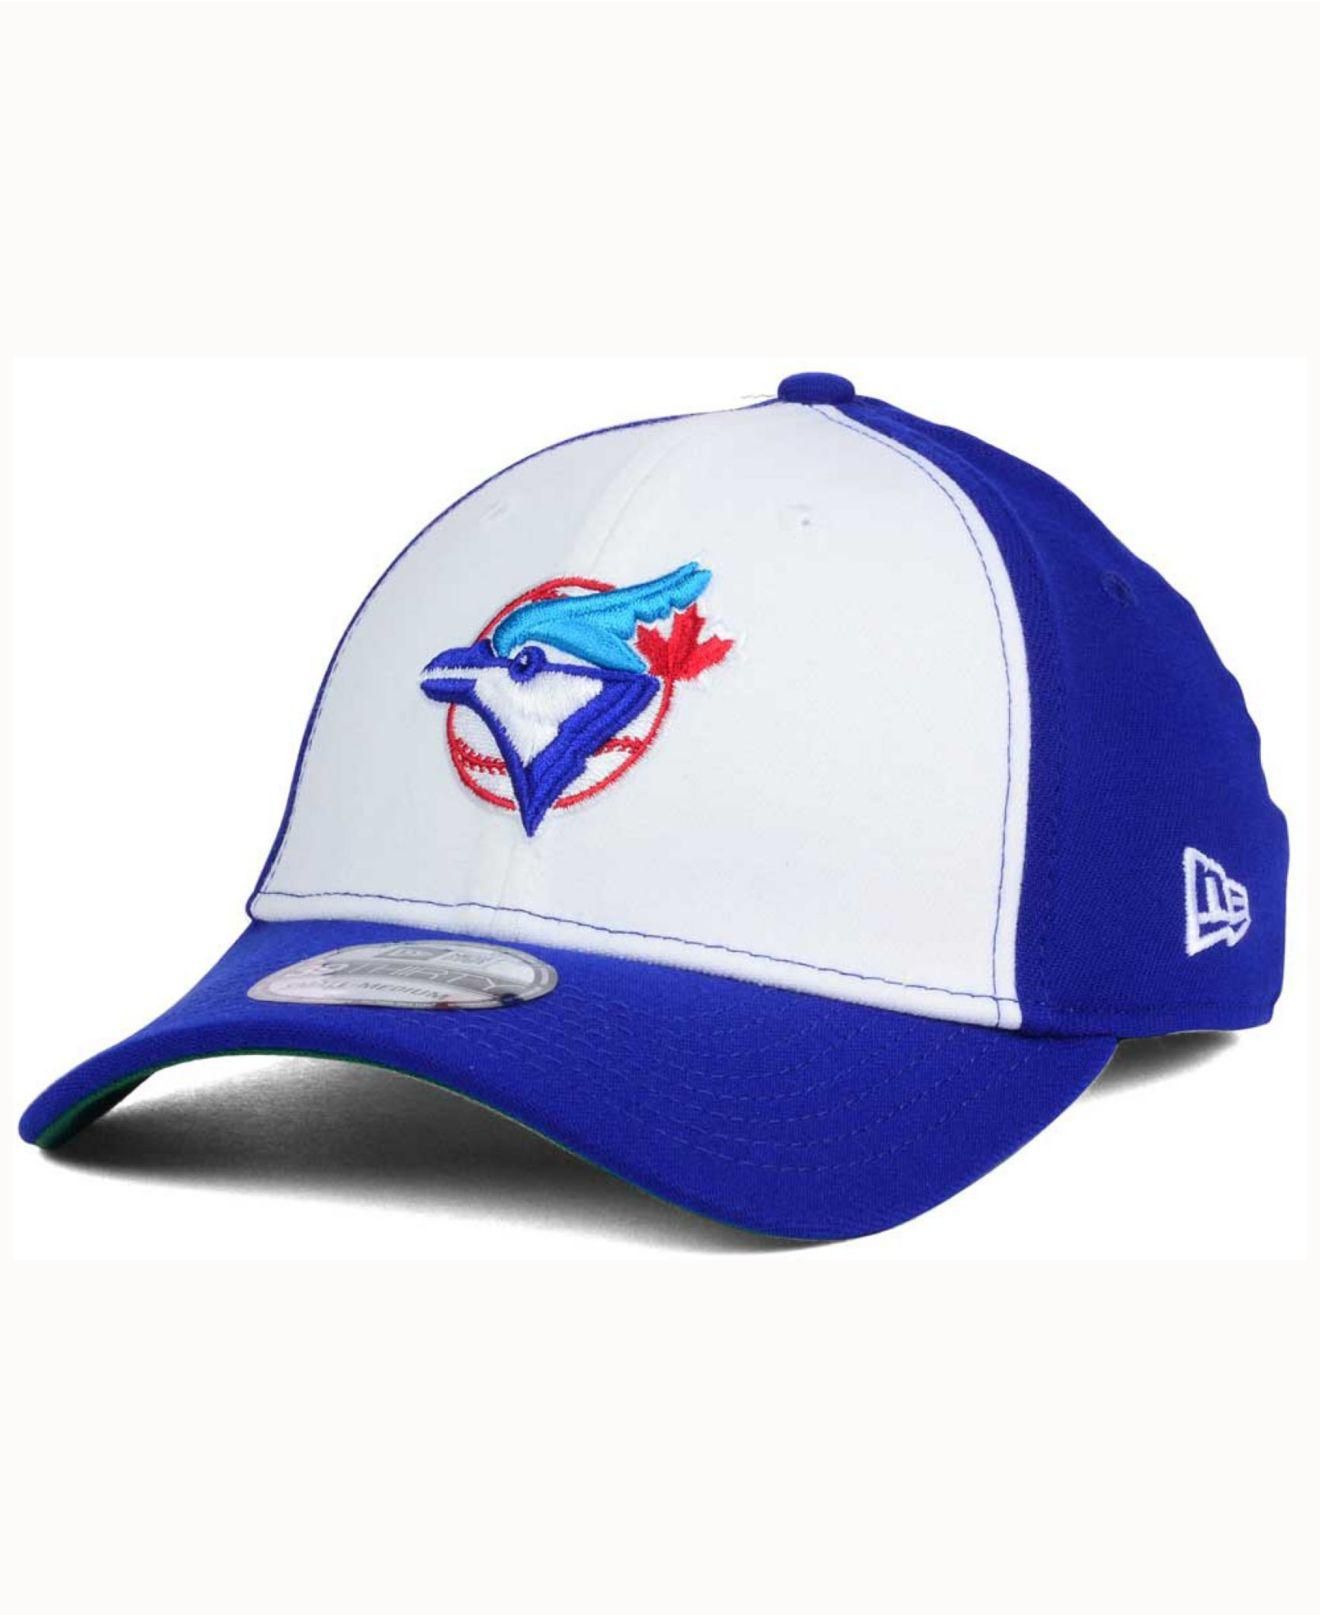 b71ec4efba1 Lyst - Ktz Toronto Blue Jays Coop 39thirty Cap in Blue for Men